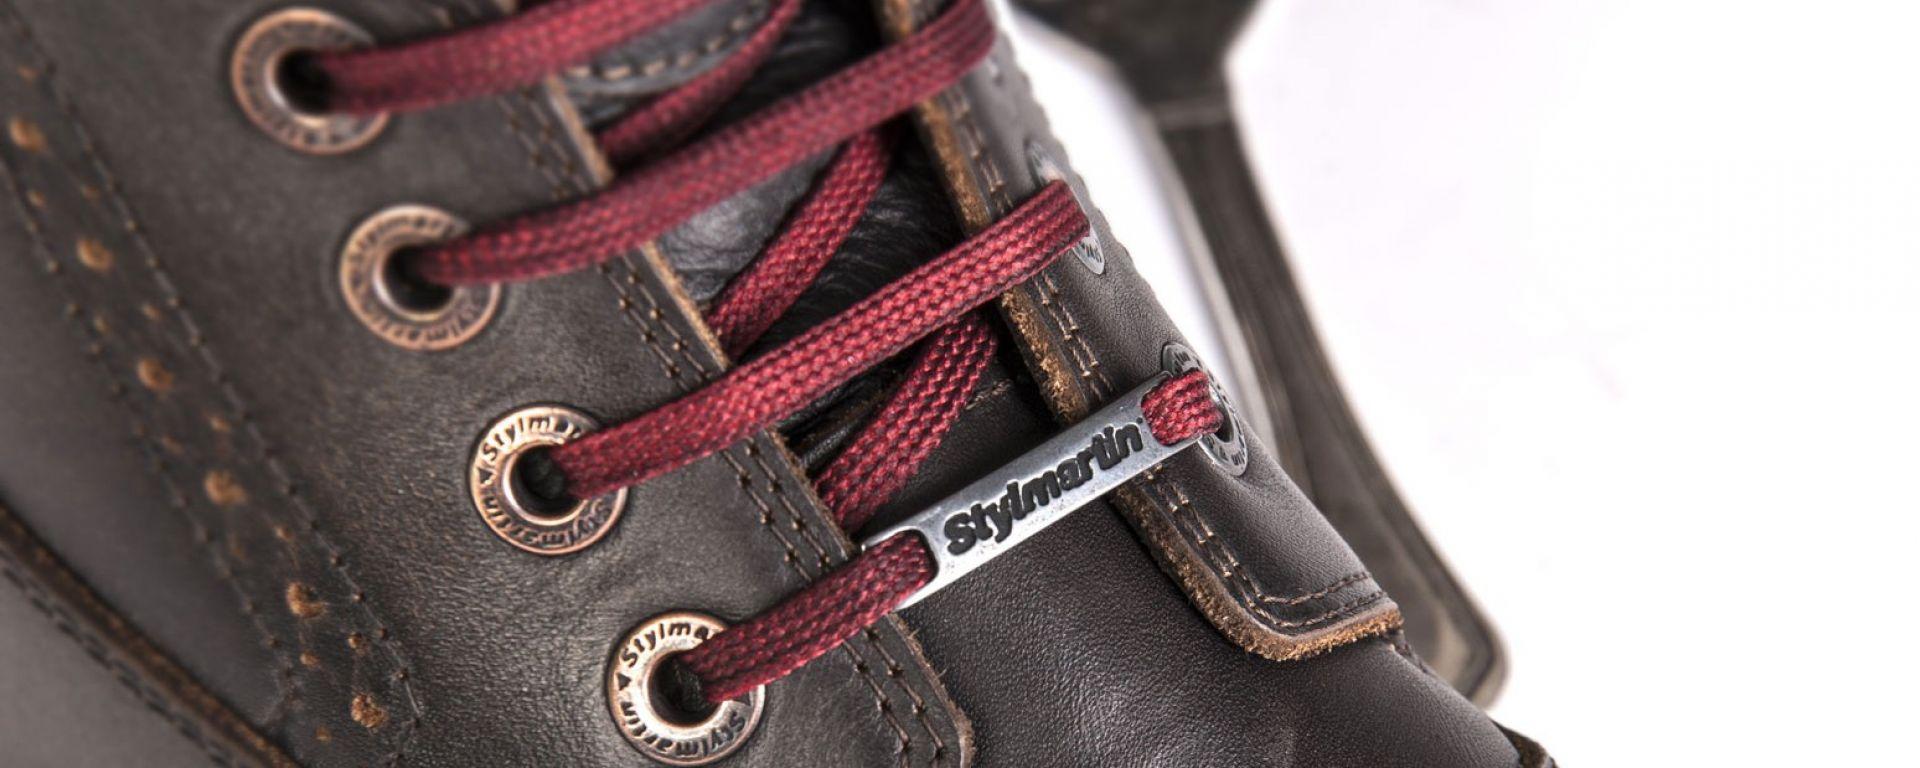 Stylmartin: scarponcino Iron, stivali Stealth Evo e Wave